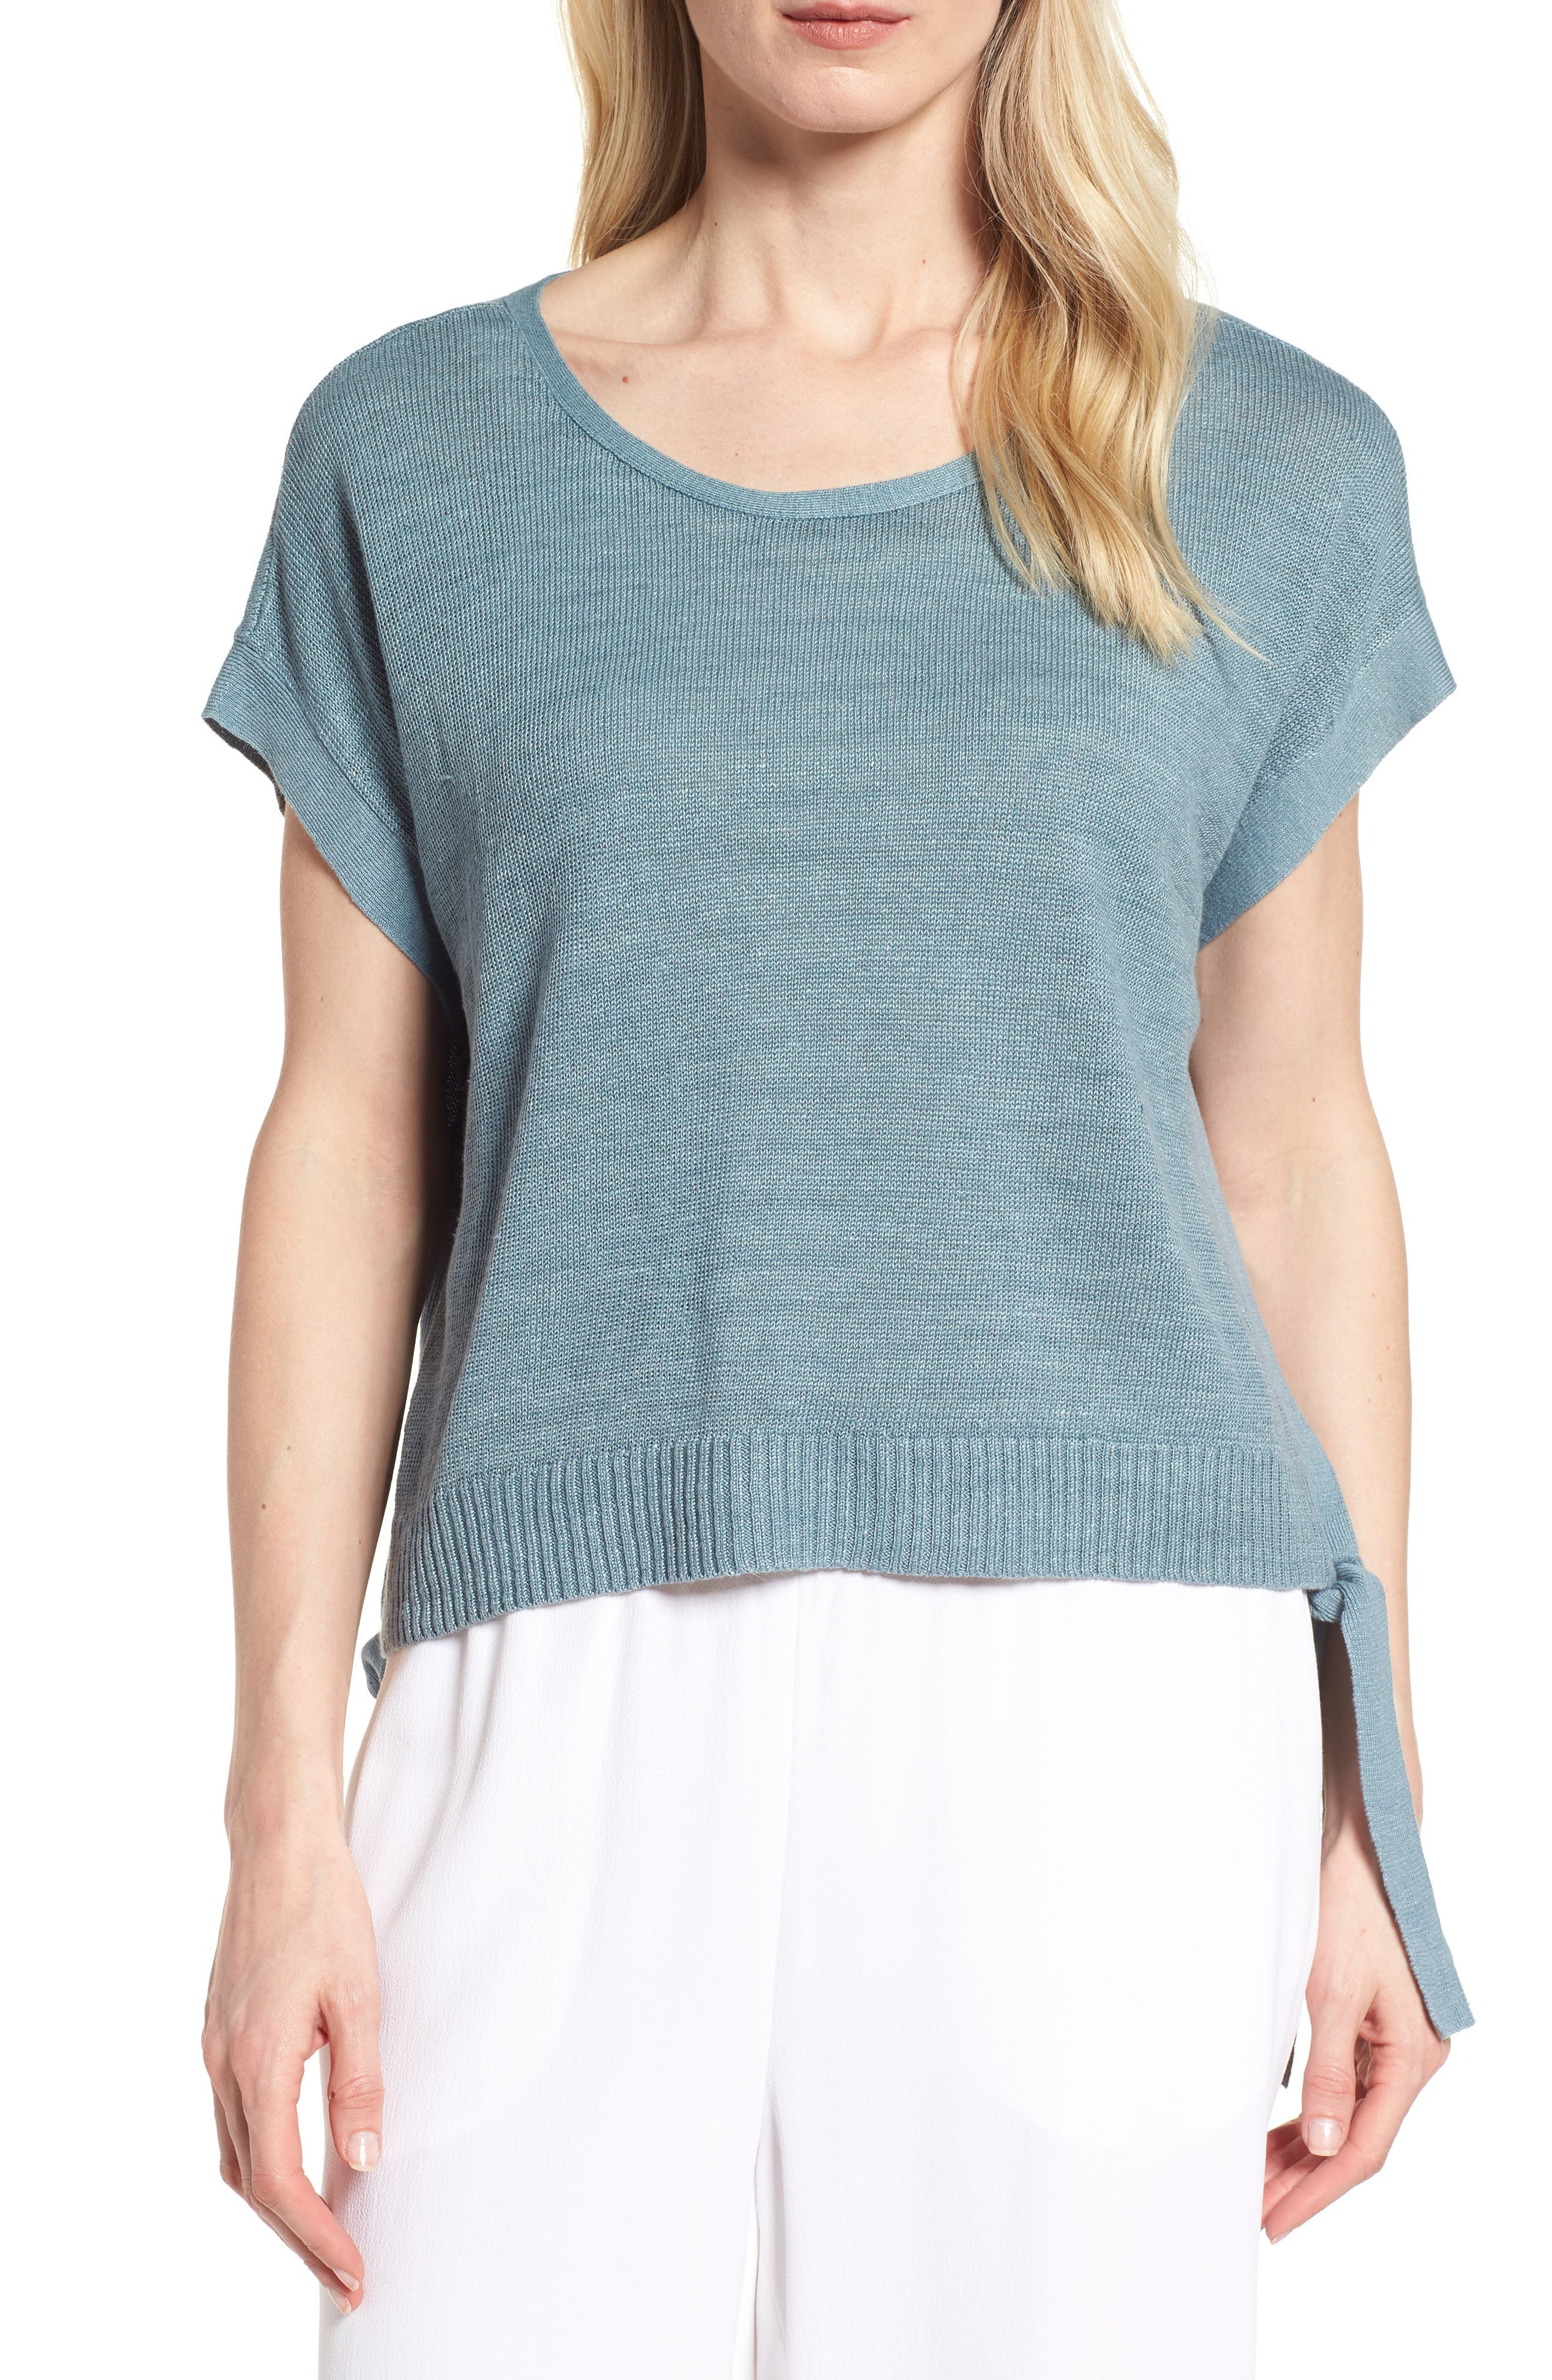 Short Organic Linen Poncho Top,                             Main thumbnail 1, color,                             Blue Steel